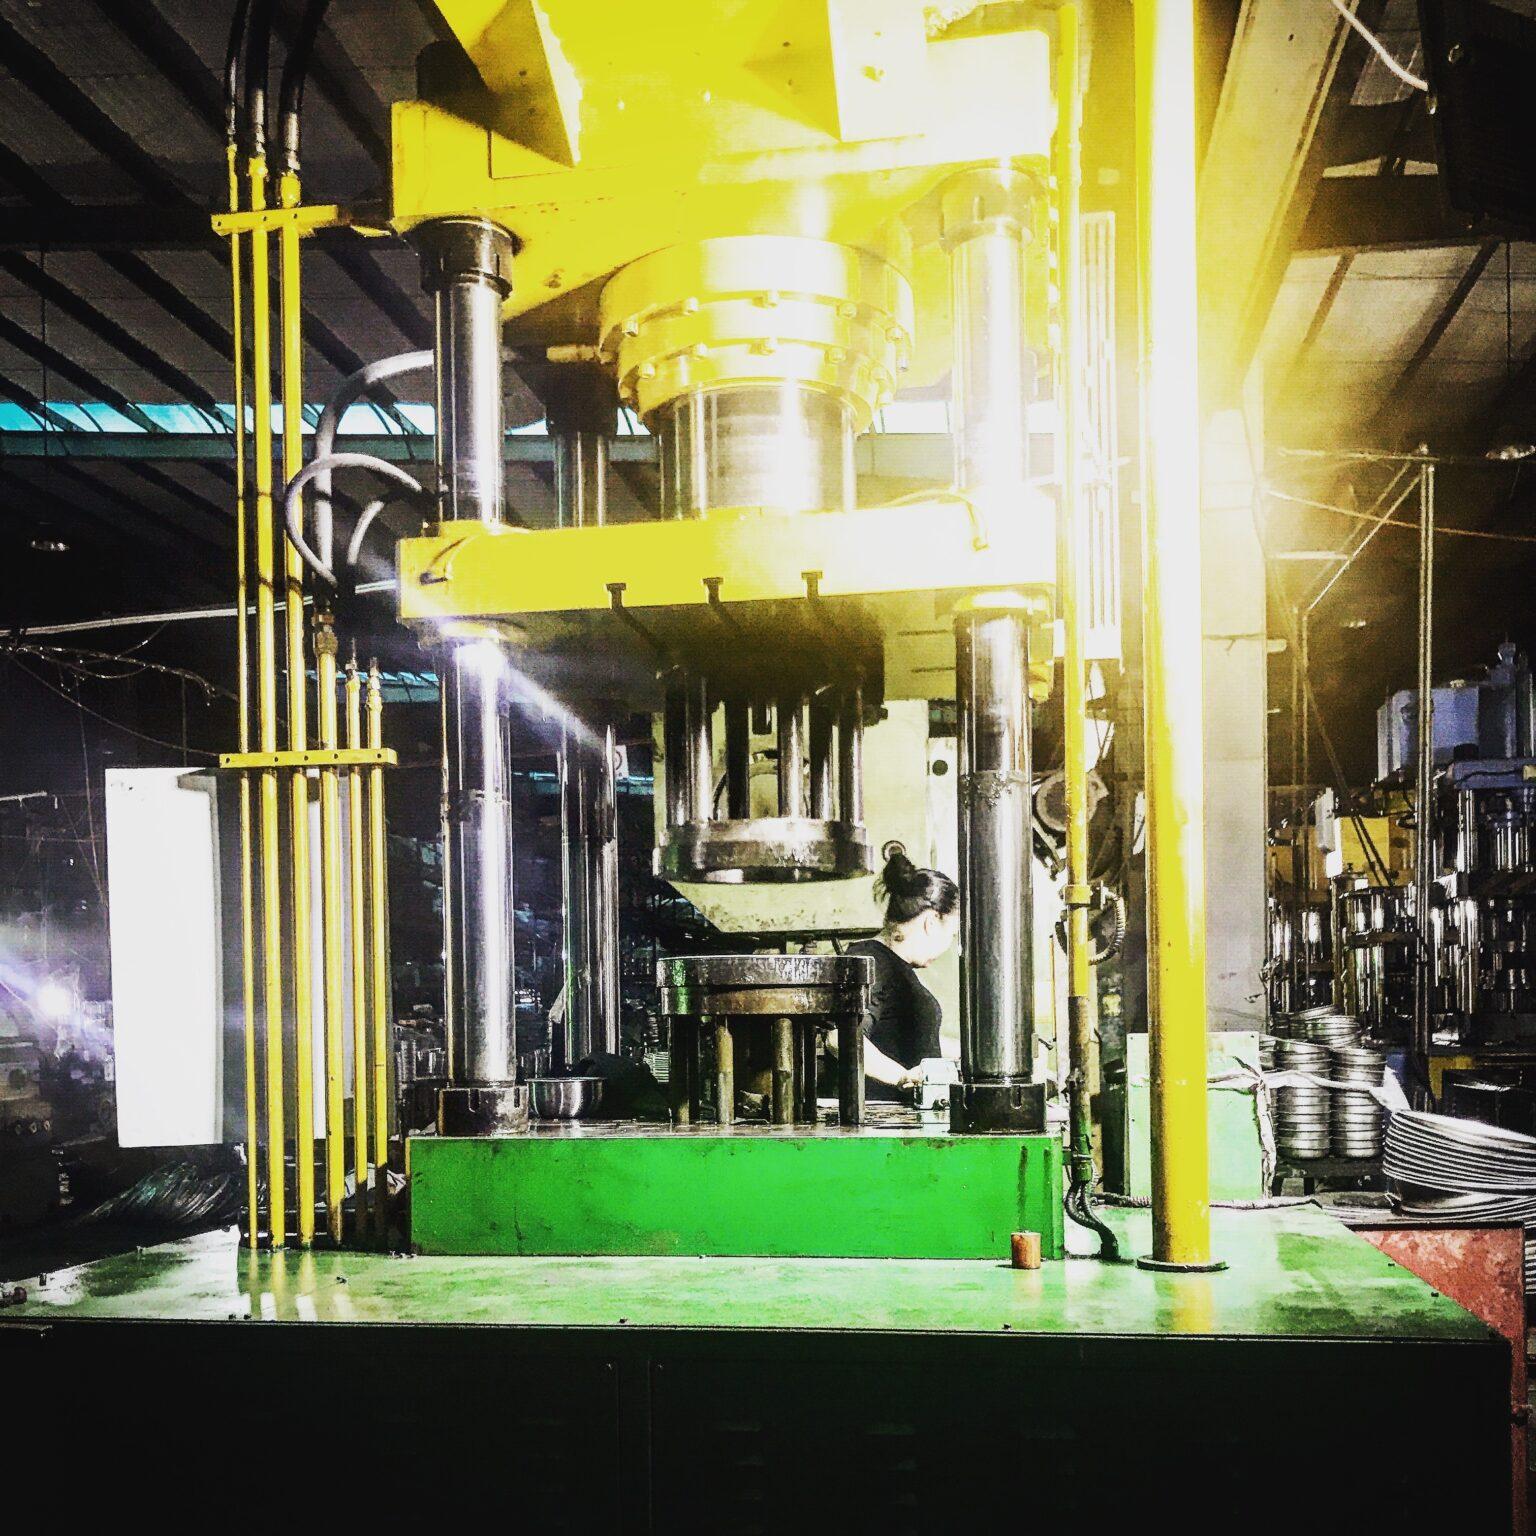 yellow industrial machinery